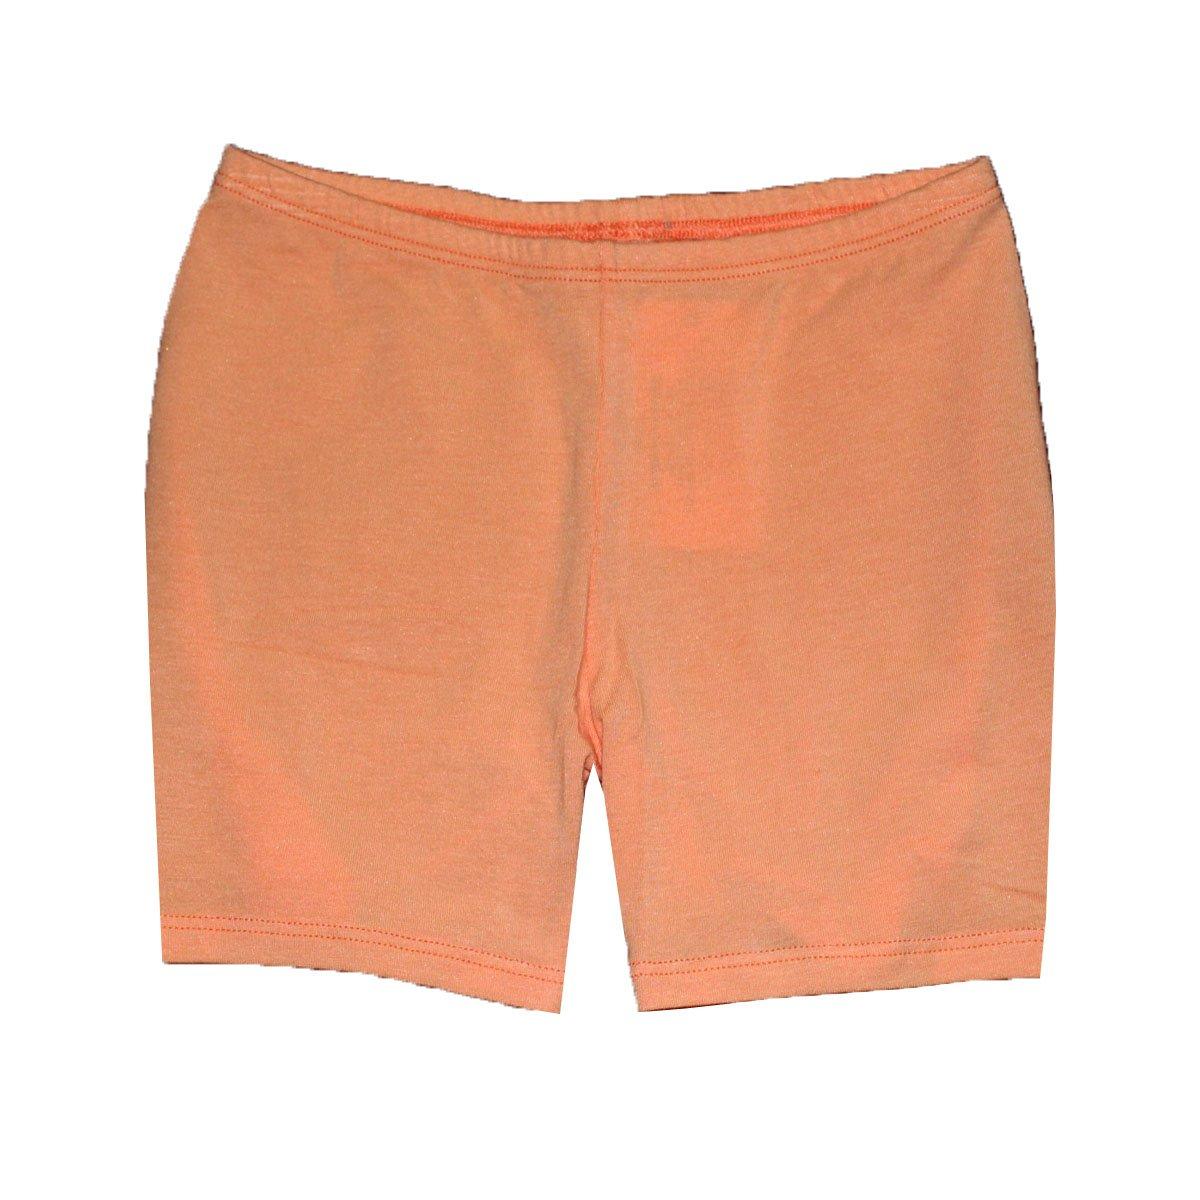 Esme Girls Soft pima Modal Bike Shorts for Sports or Under Skirts 2-16 BKRS99